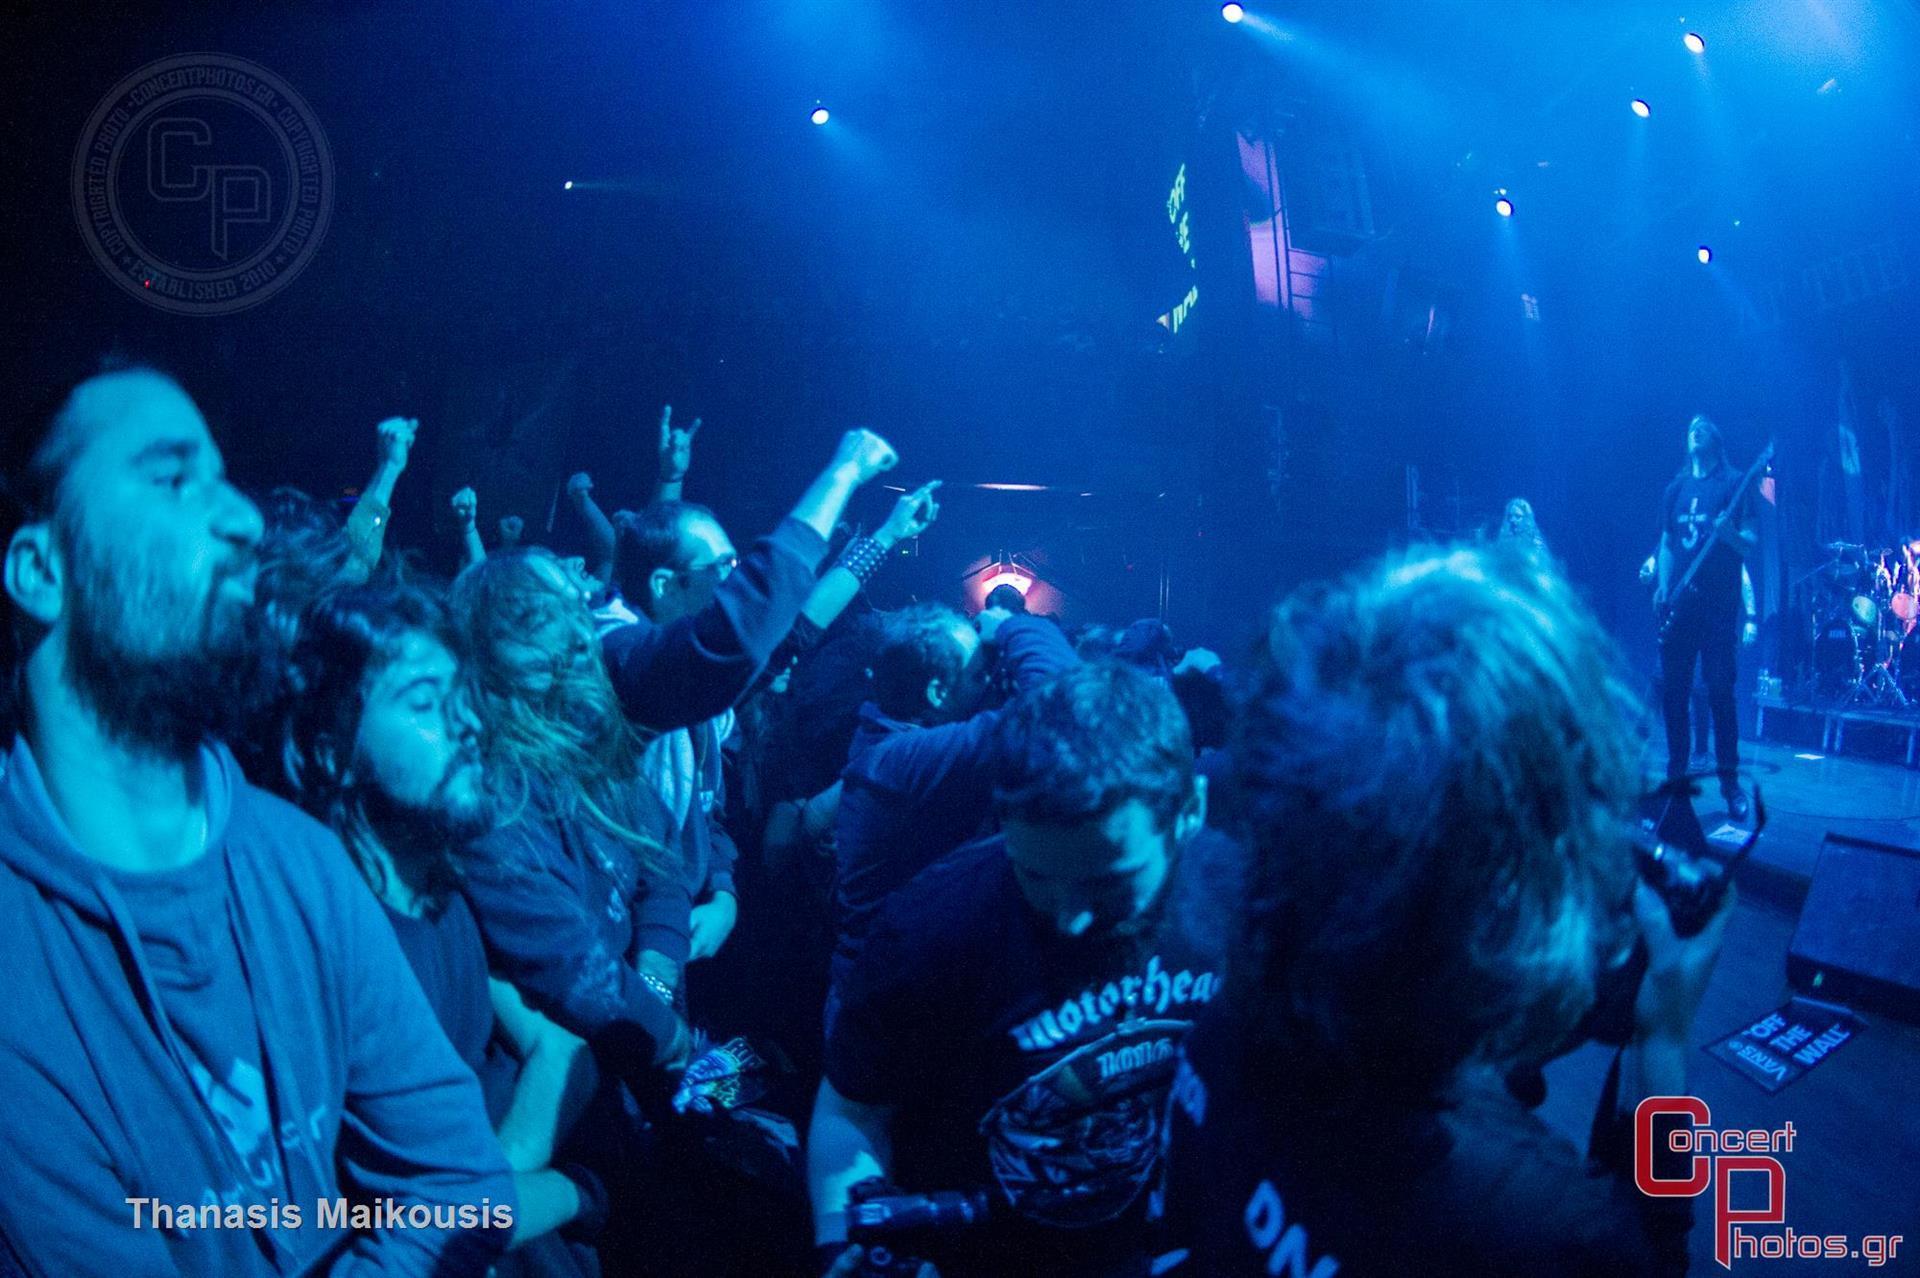 At The Gates-At The Gates Fuzz photographer: Thanasis Maikousis - ConcertPhotos - 20150109_2338_19